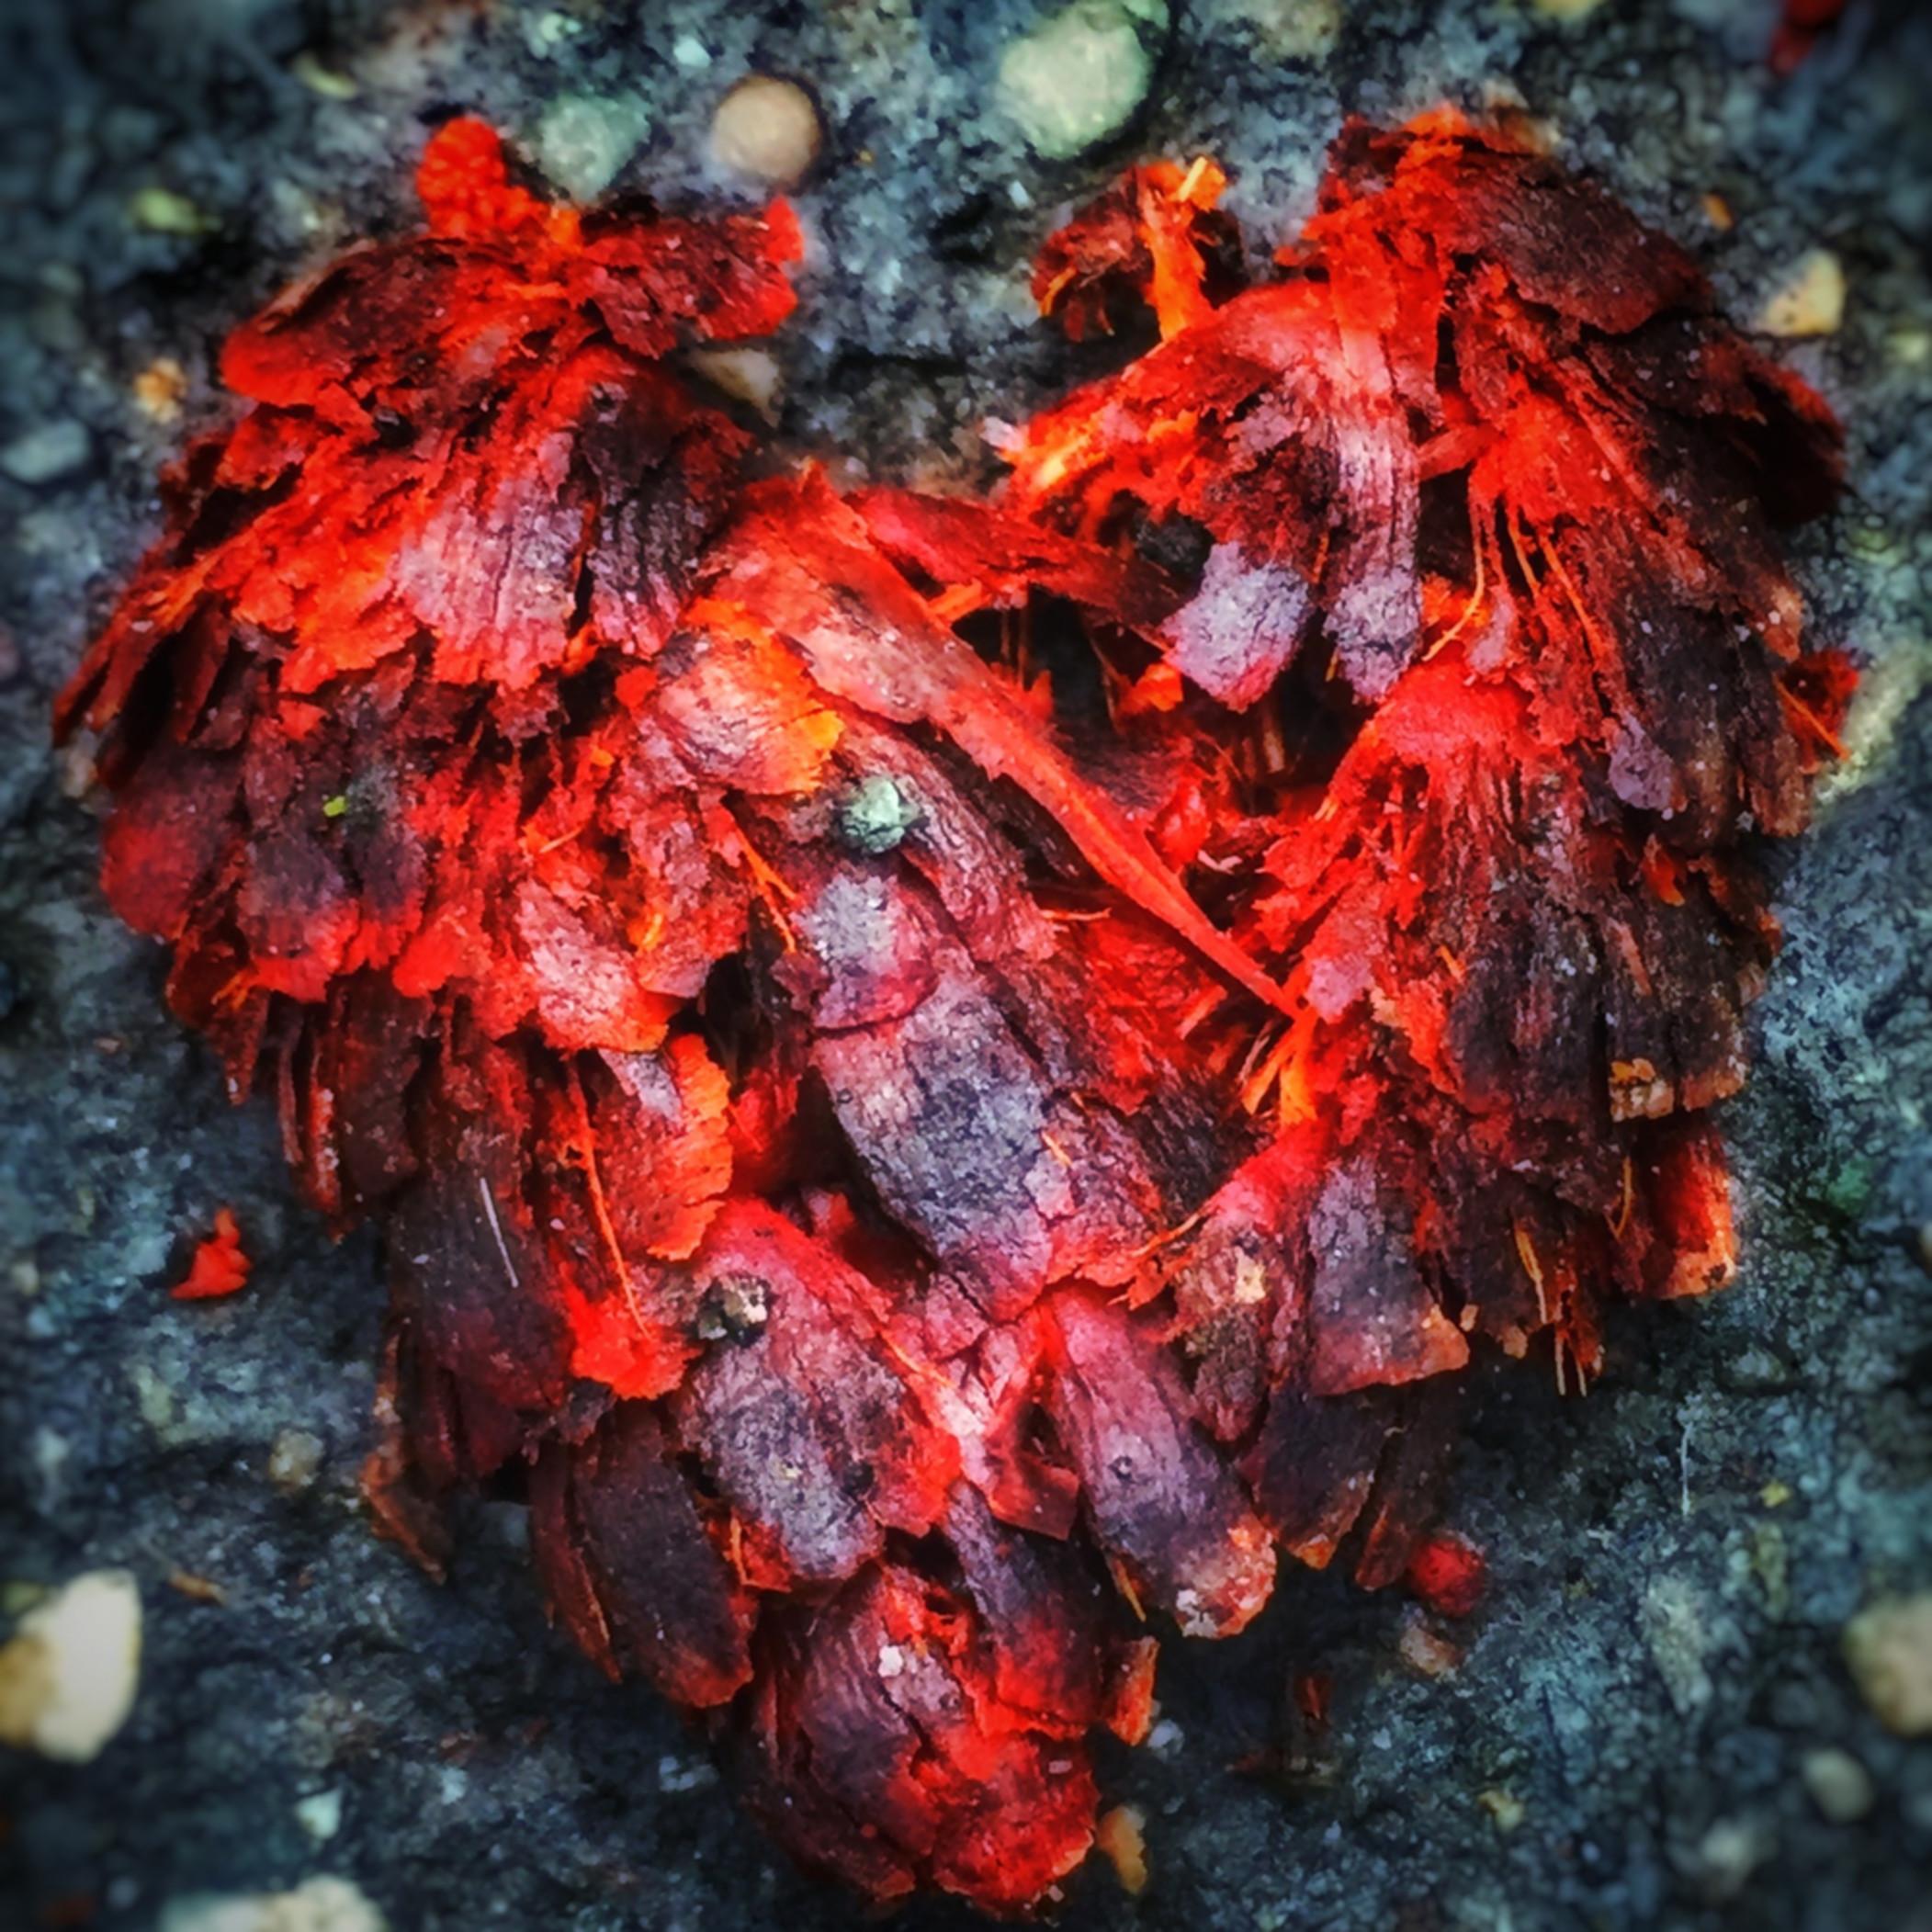 Lion heart img 6818 zwcfsu